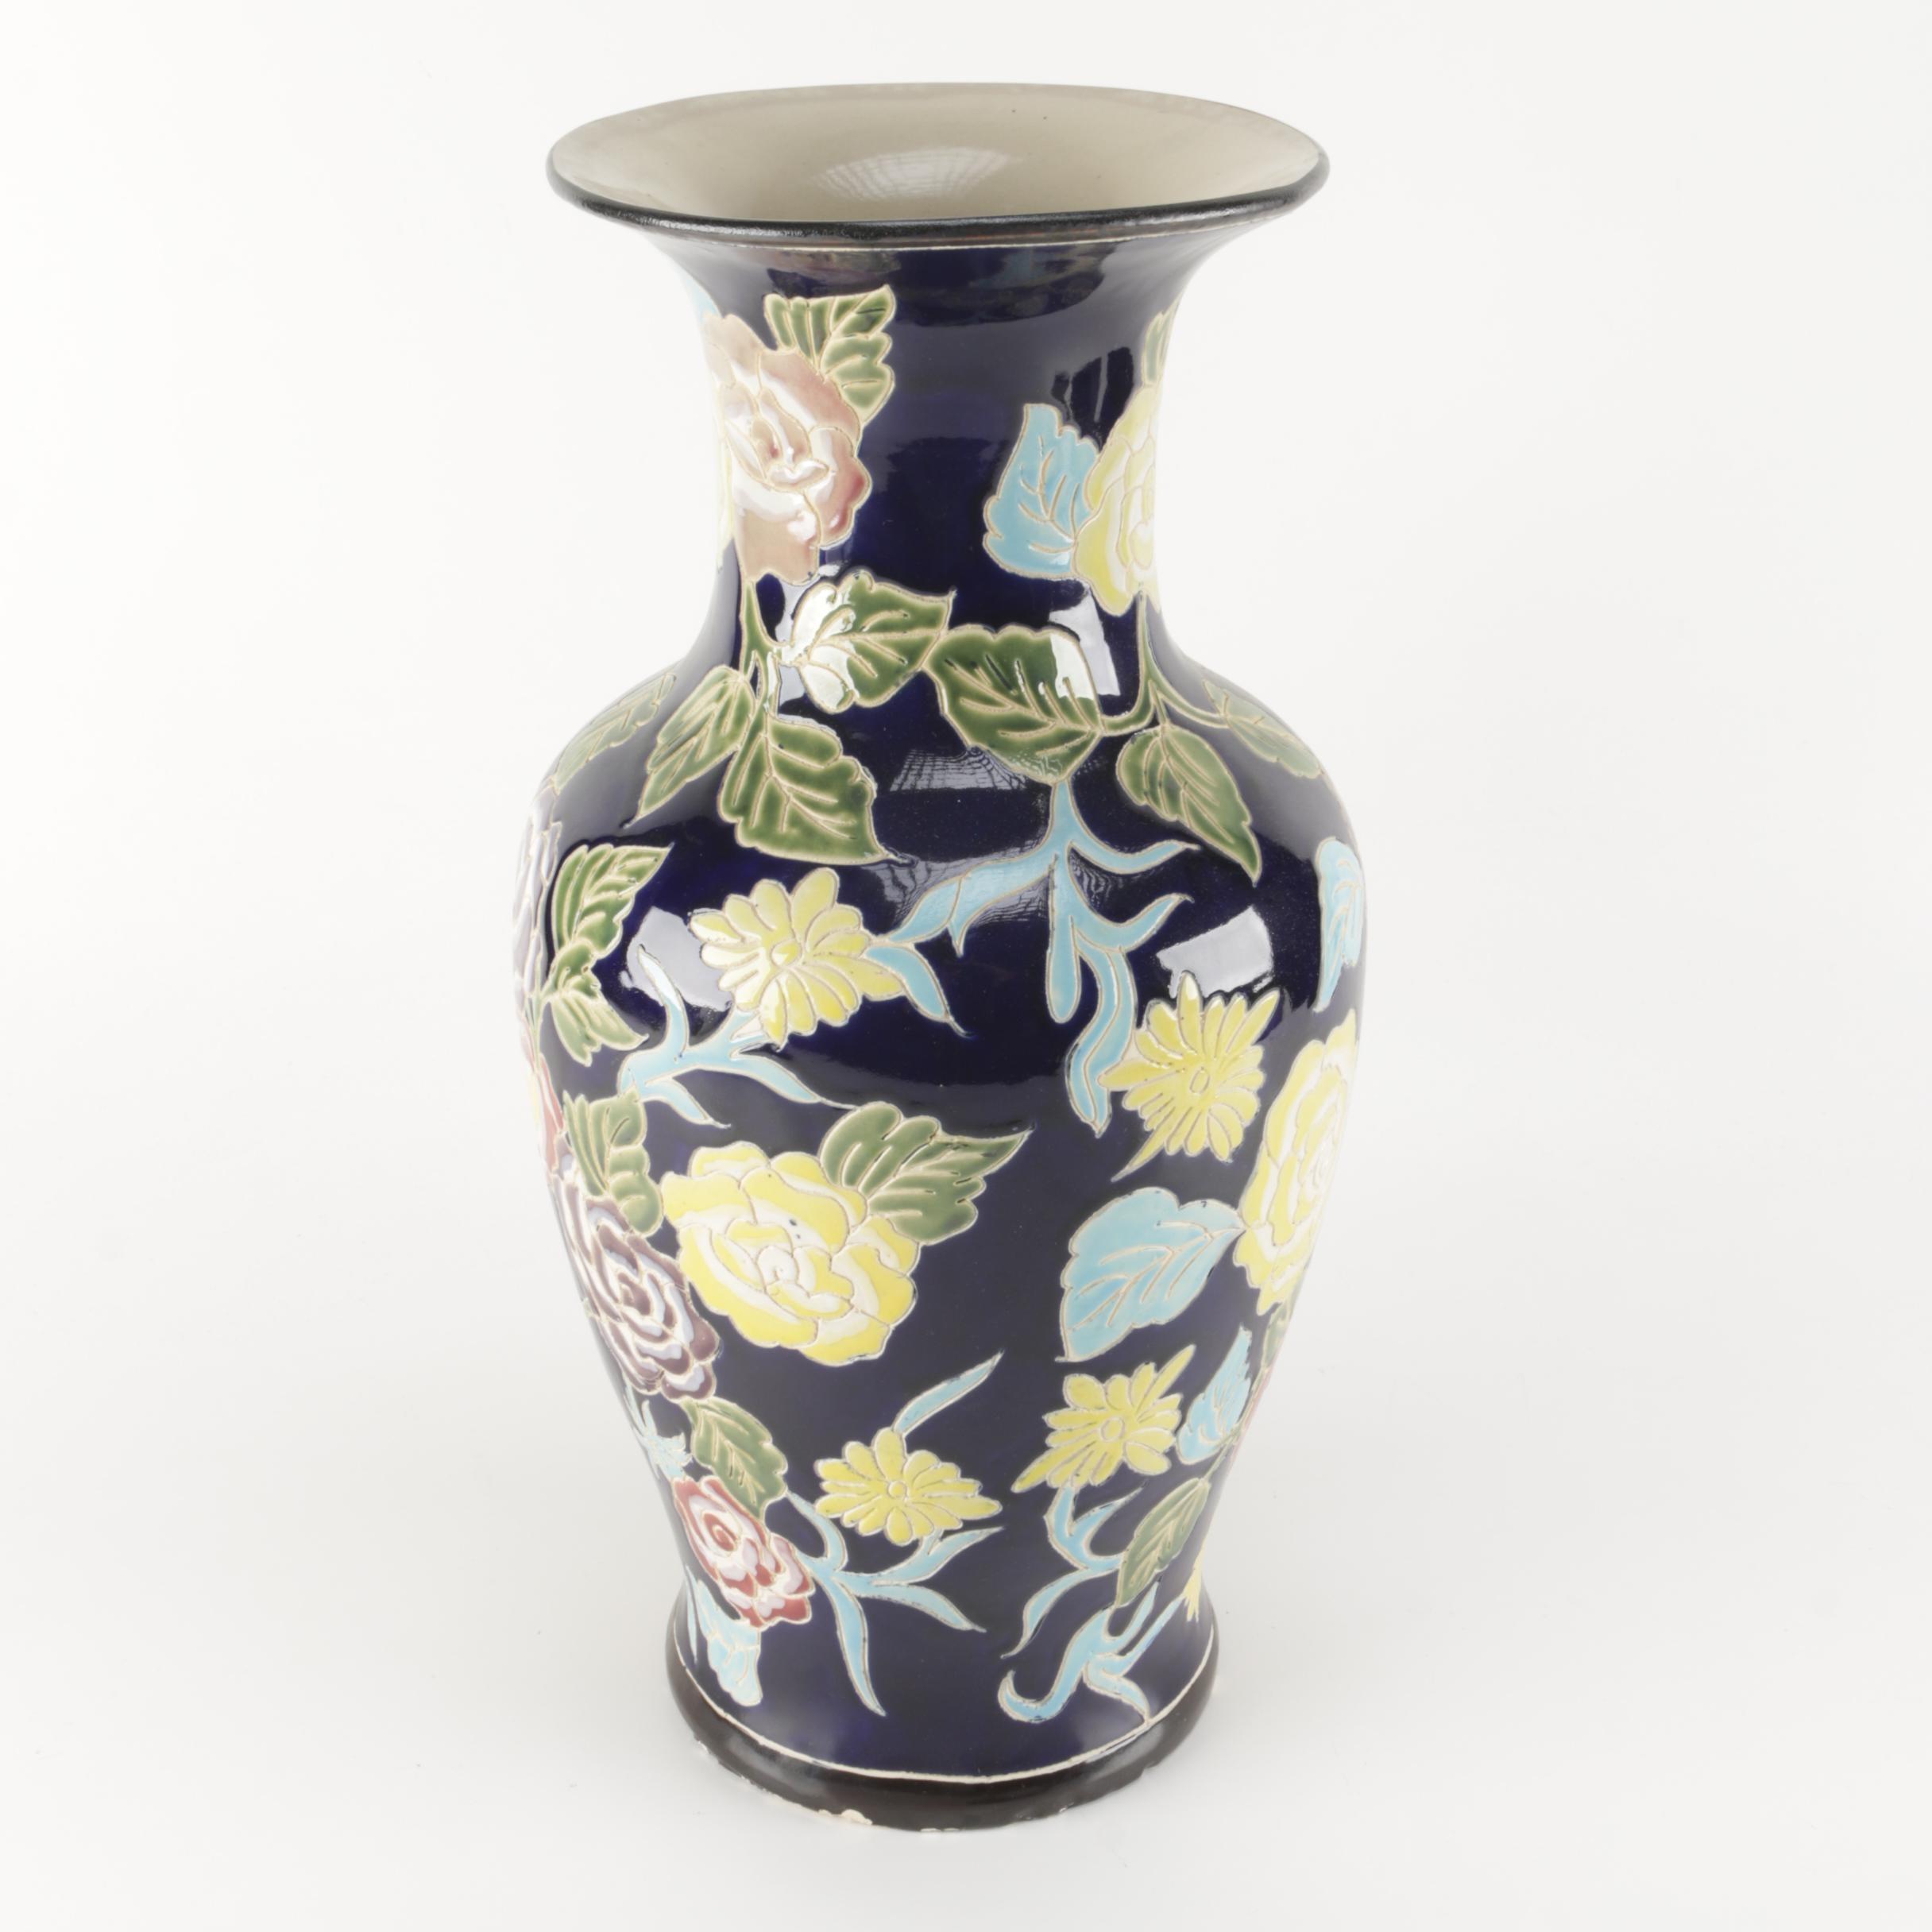 Incised Floral Ceramic Vase